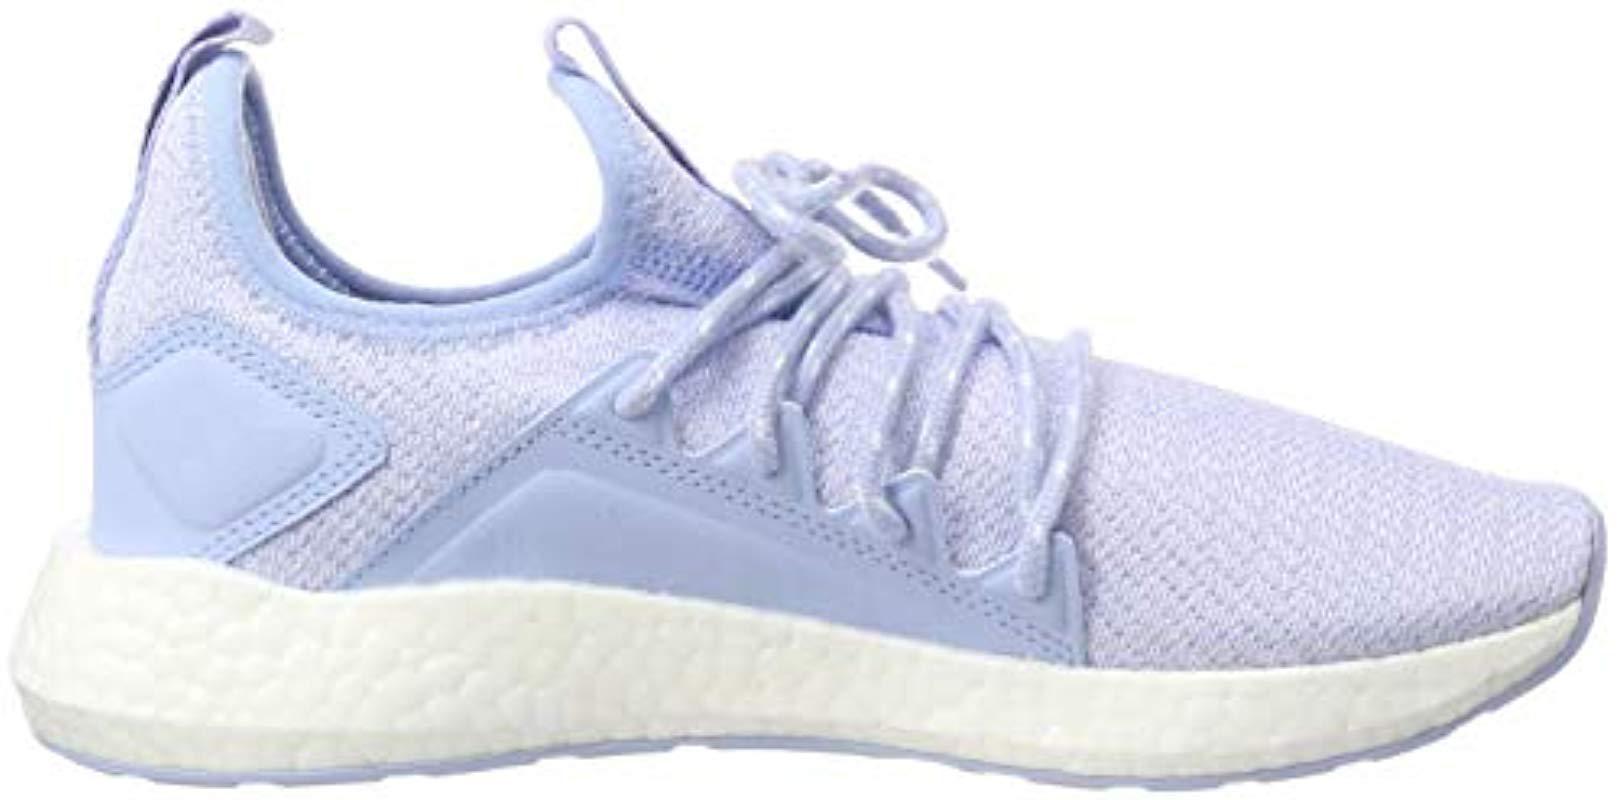 Women's Blue Nrgy Neko Knit Wns Training Shoes